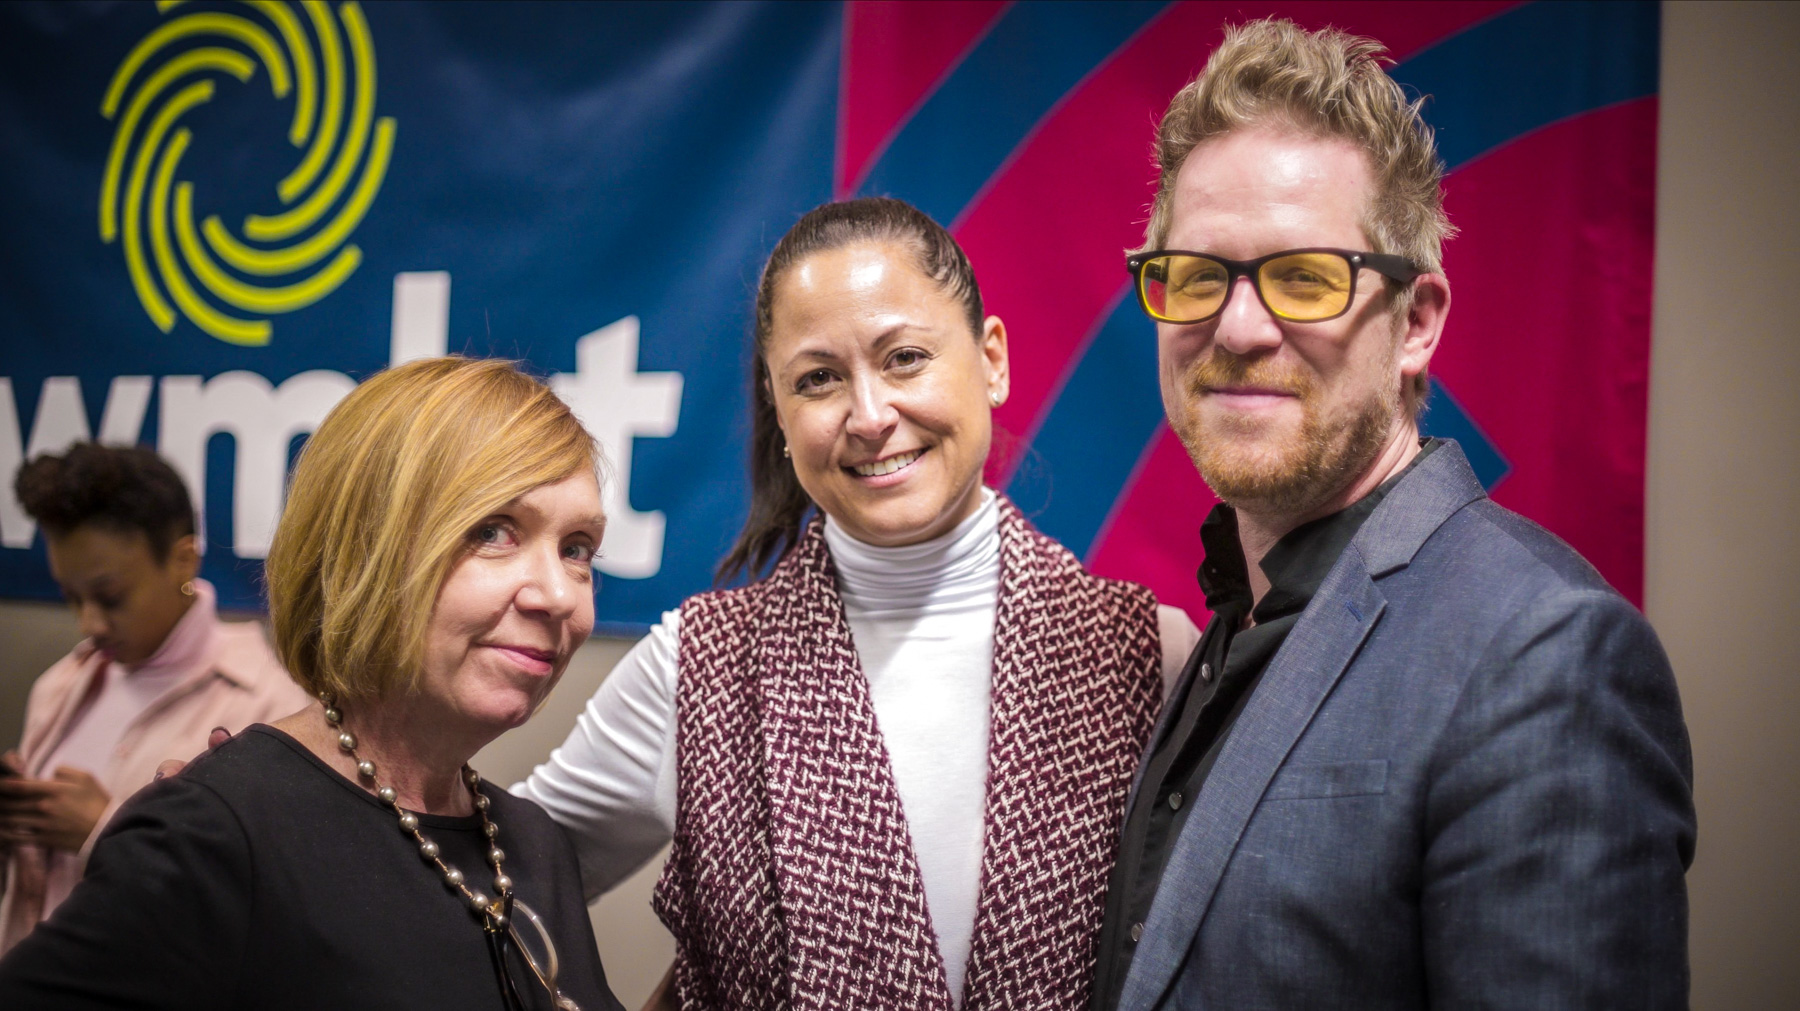 Upstate Alliance for the Creative Economy photos 2017-2018